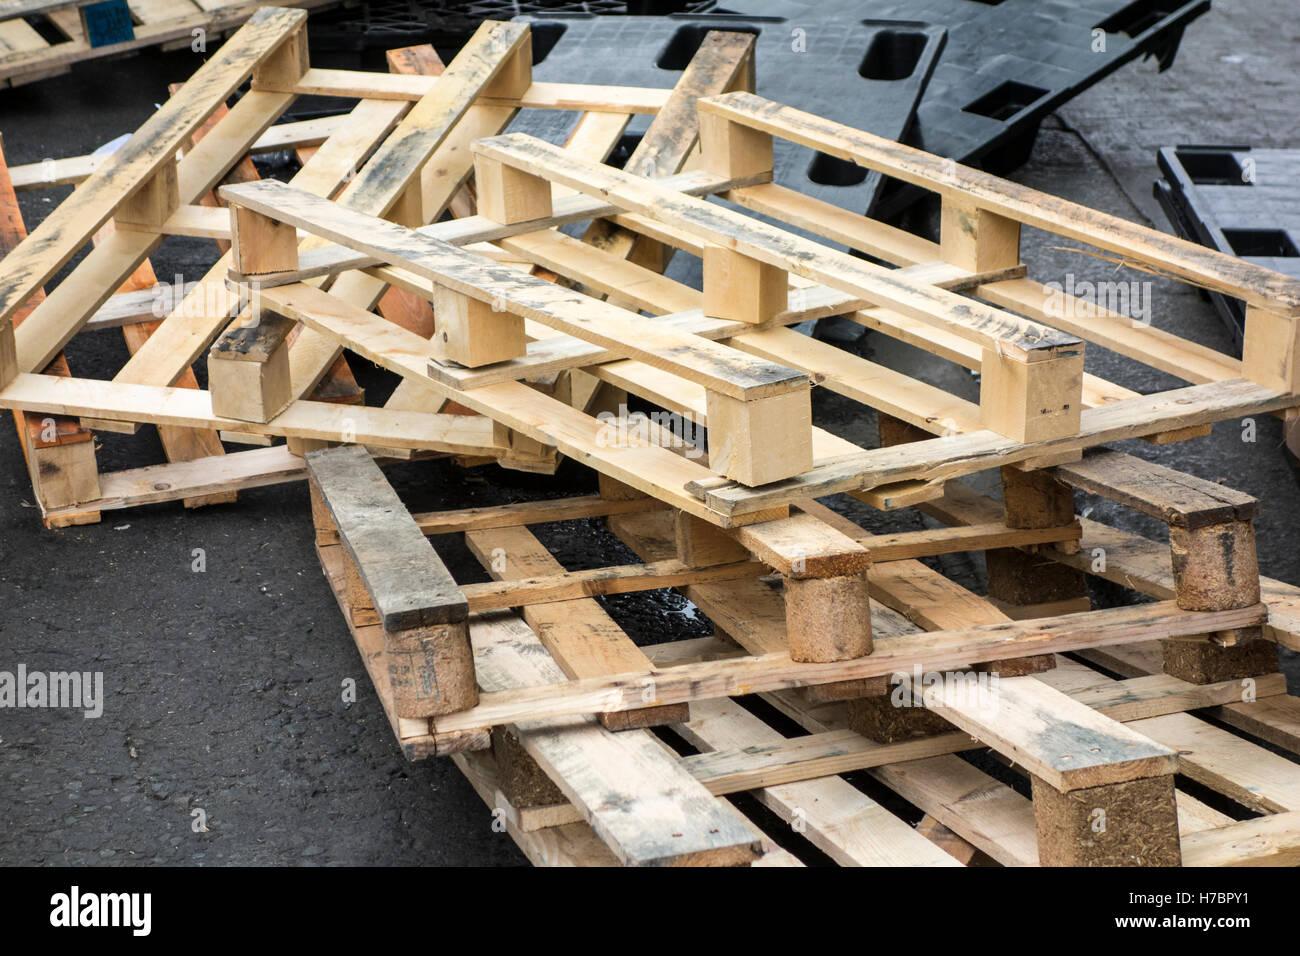 Pile of wooden crates outside on the pavement outside Smithfield Market, London, UK - Stock Image